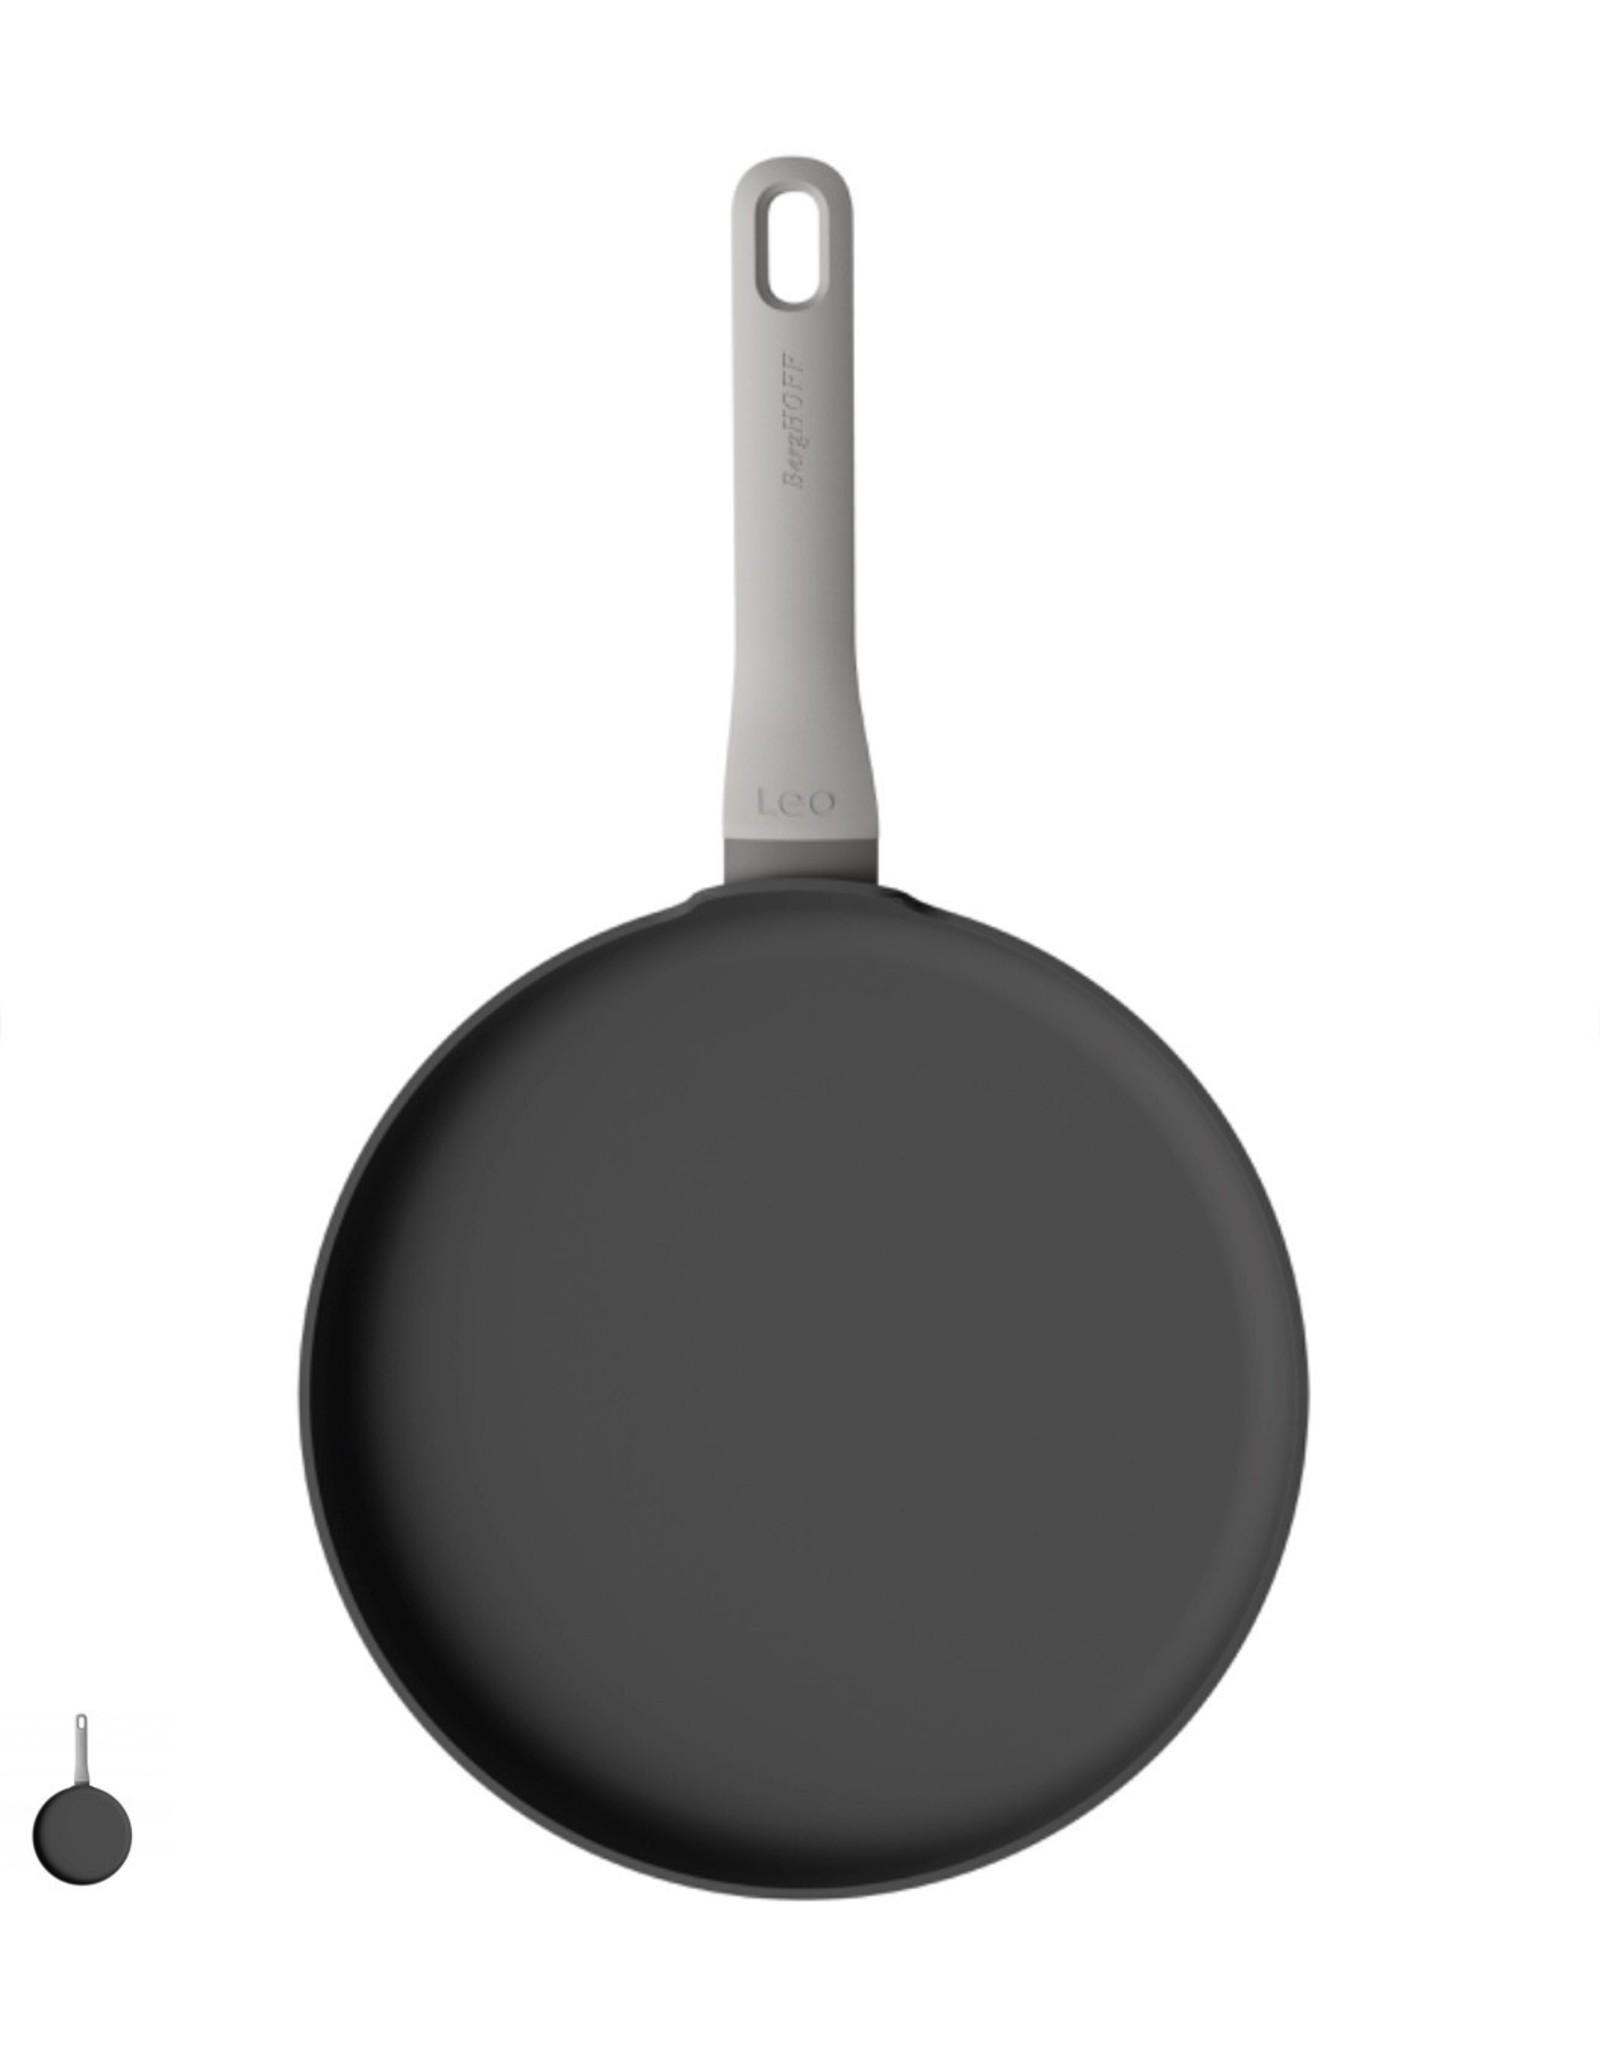 Berghoff BergHoff. Leo Line omeletpan 25cm